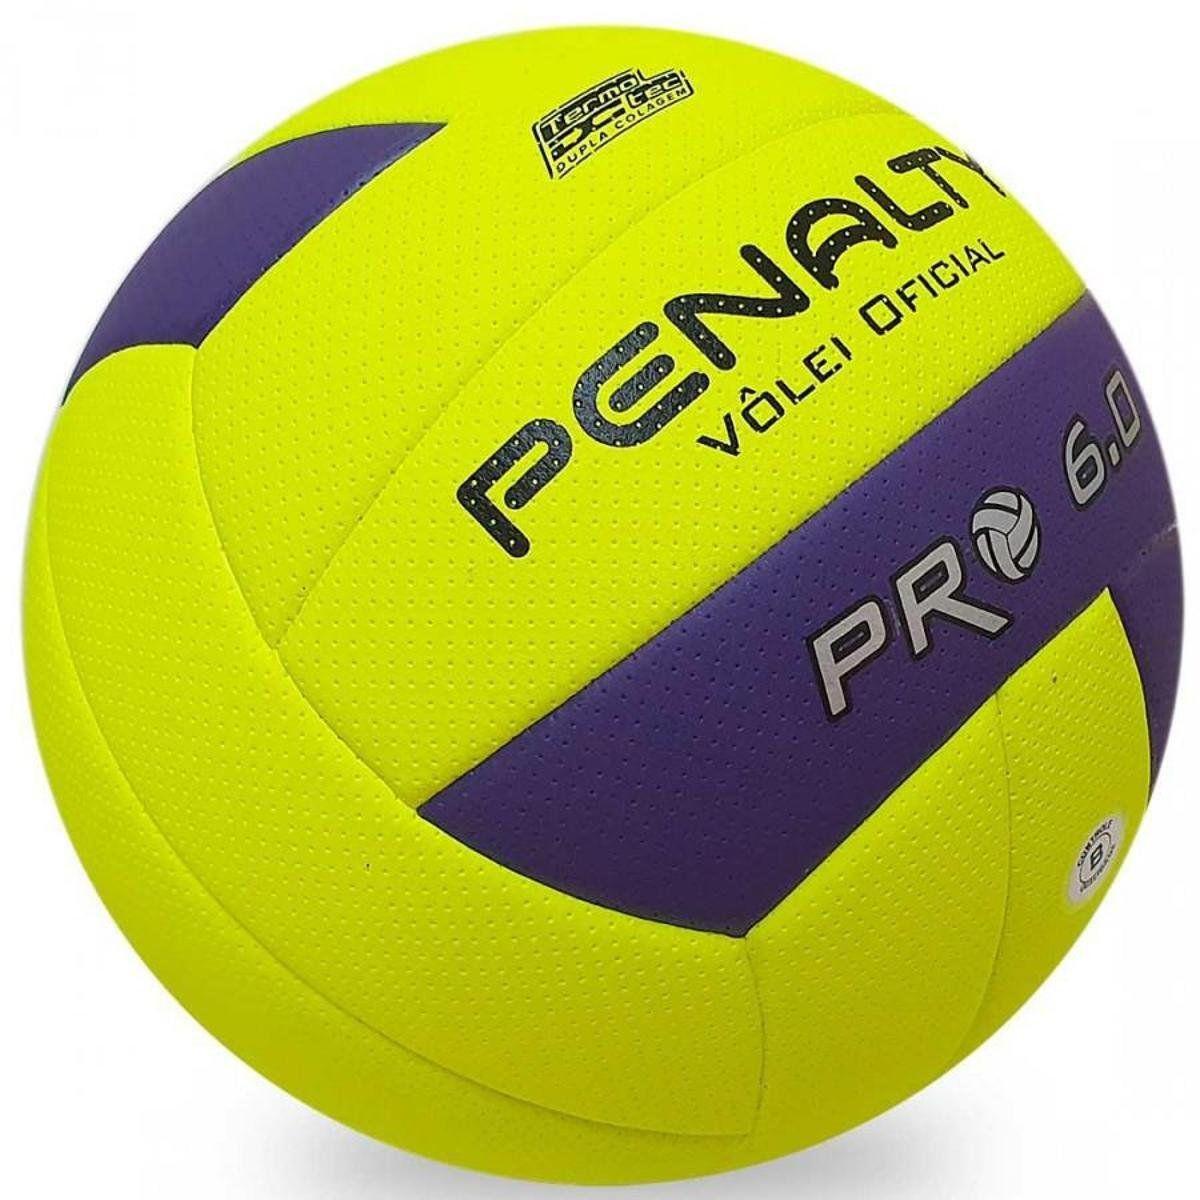 Bola Vôlei Penalty PRO 6.0 X Amarela